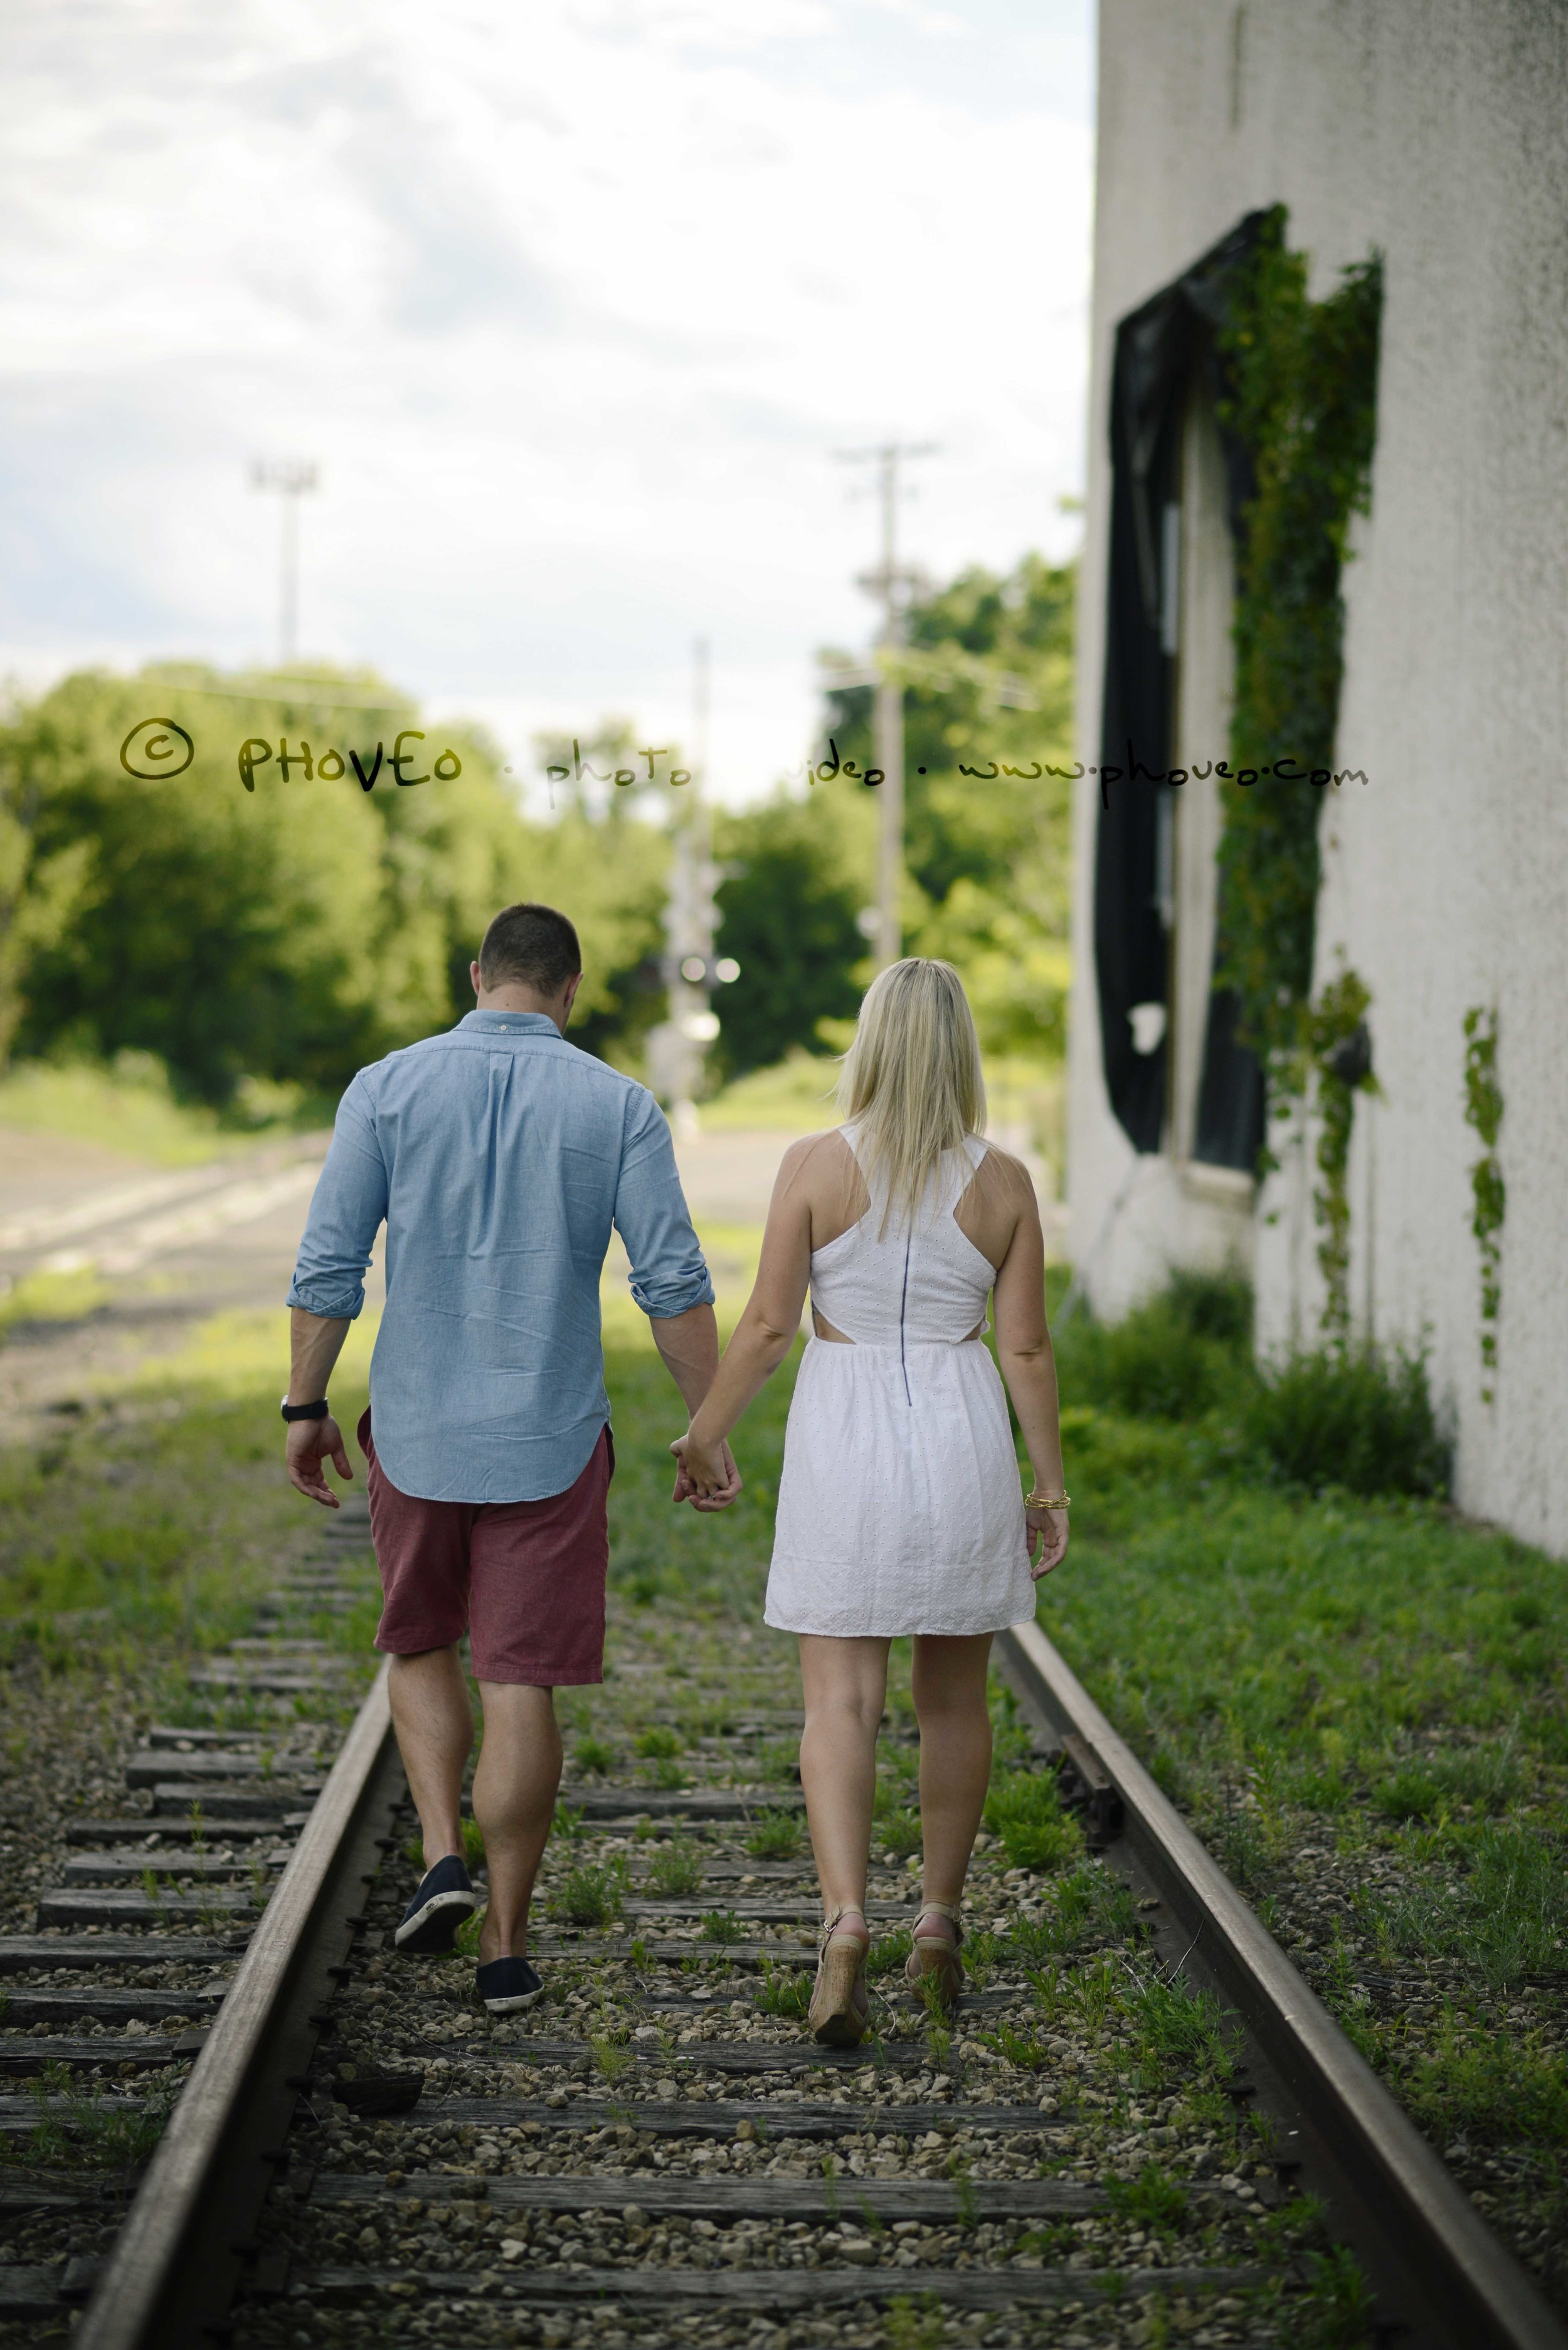 WM_20150621_Alyssa+Mike_28.jpg